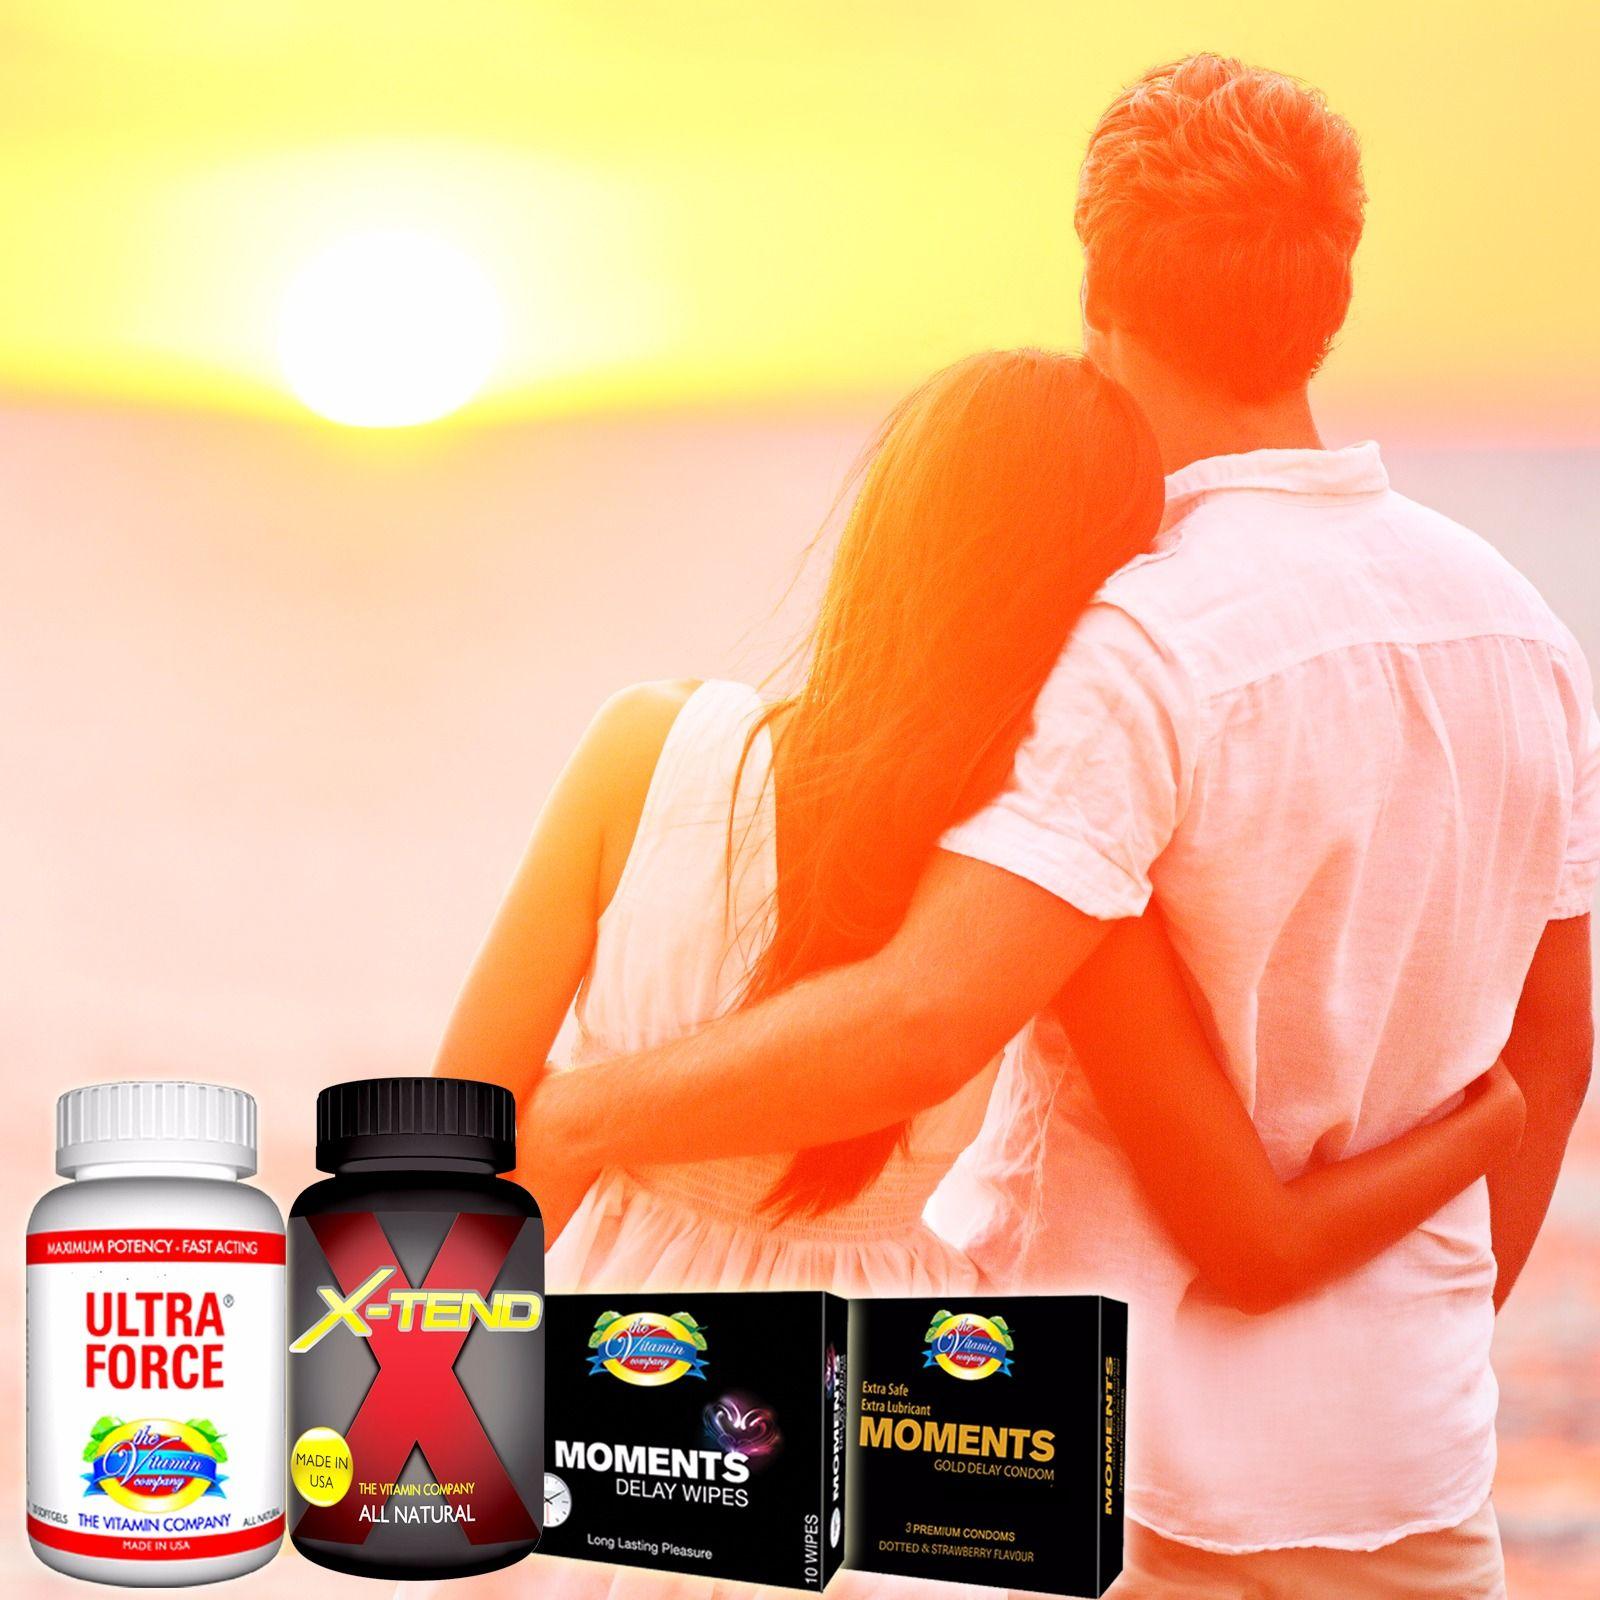 X Tend The Vitamin Company Vitamin Company Natural Supplements